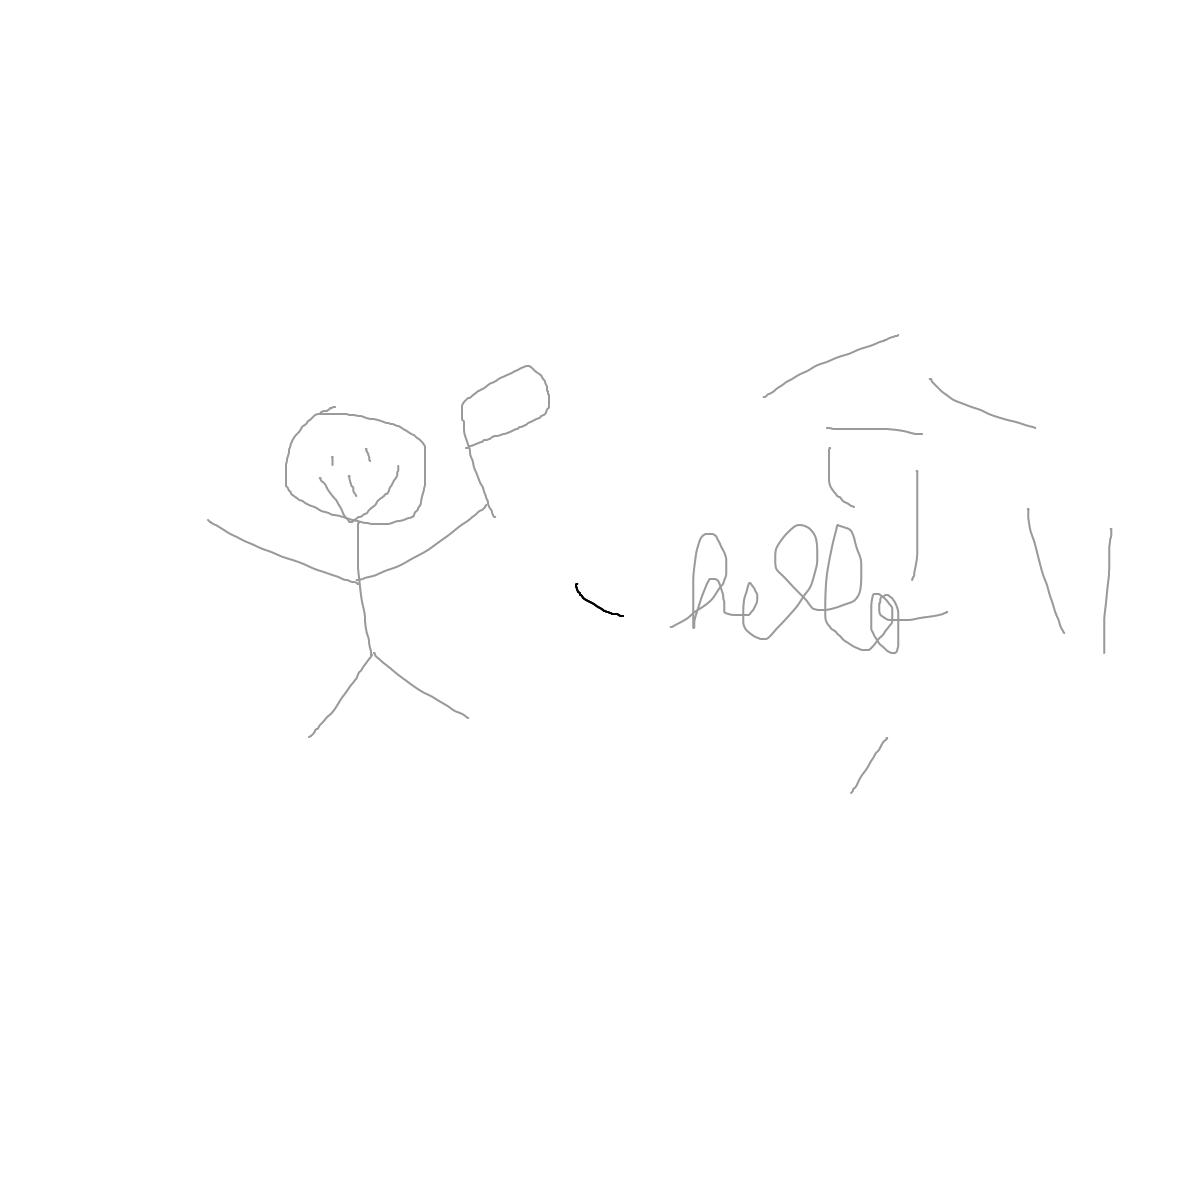 BAAAM drawing#420 lat:49.8893127441406250lng: -97.1850509643554700